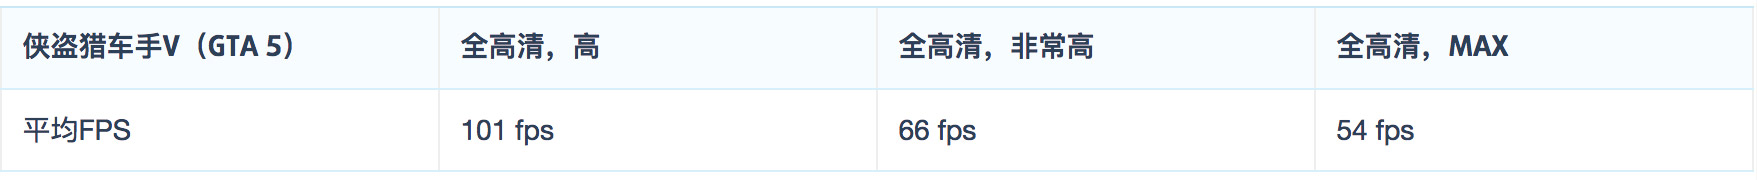 ASUS 华硕 ROG枪神2s plus(s7cw)评测